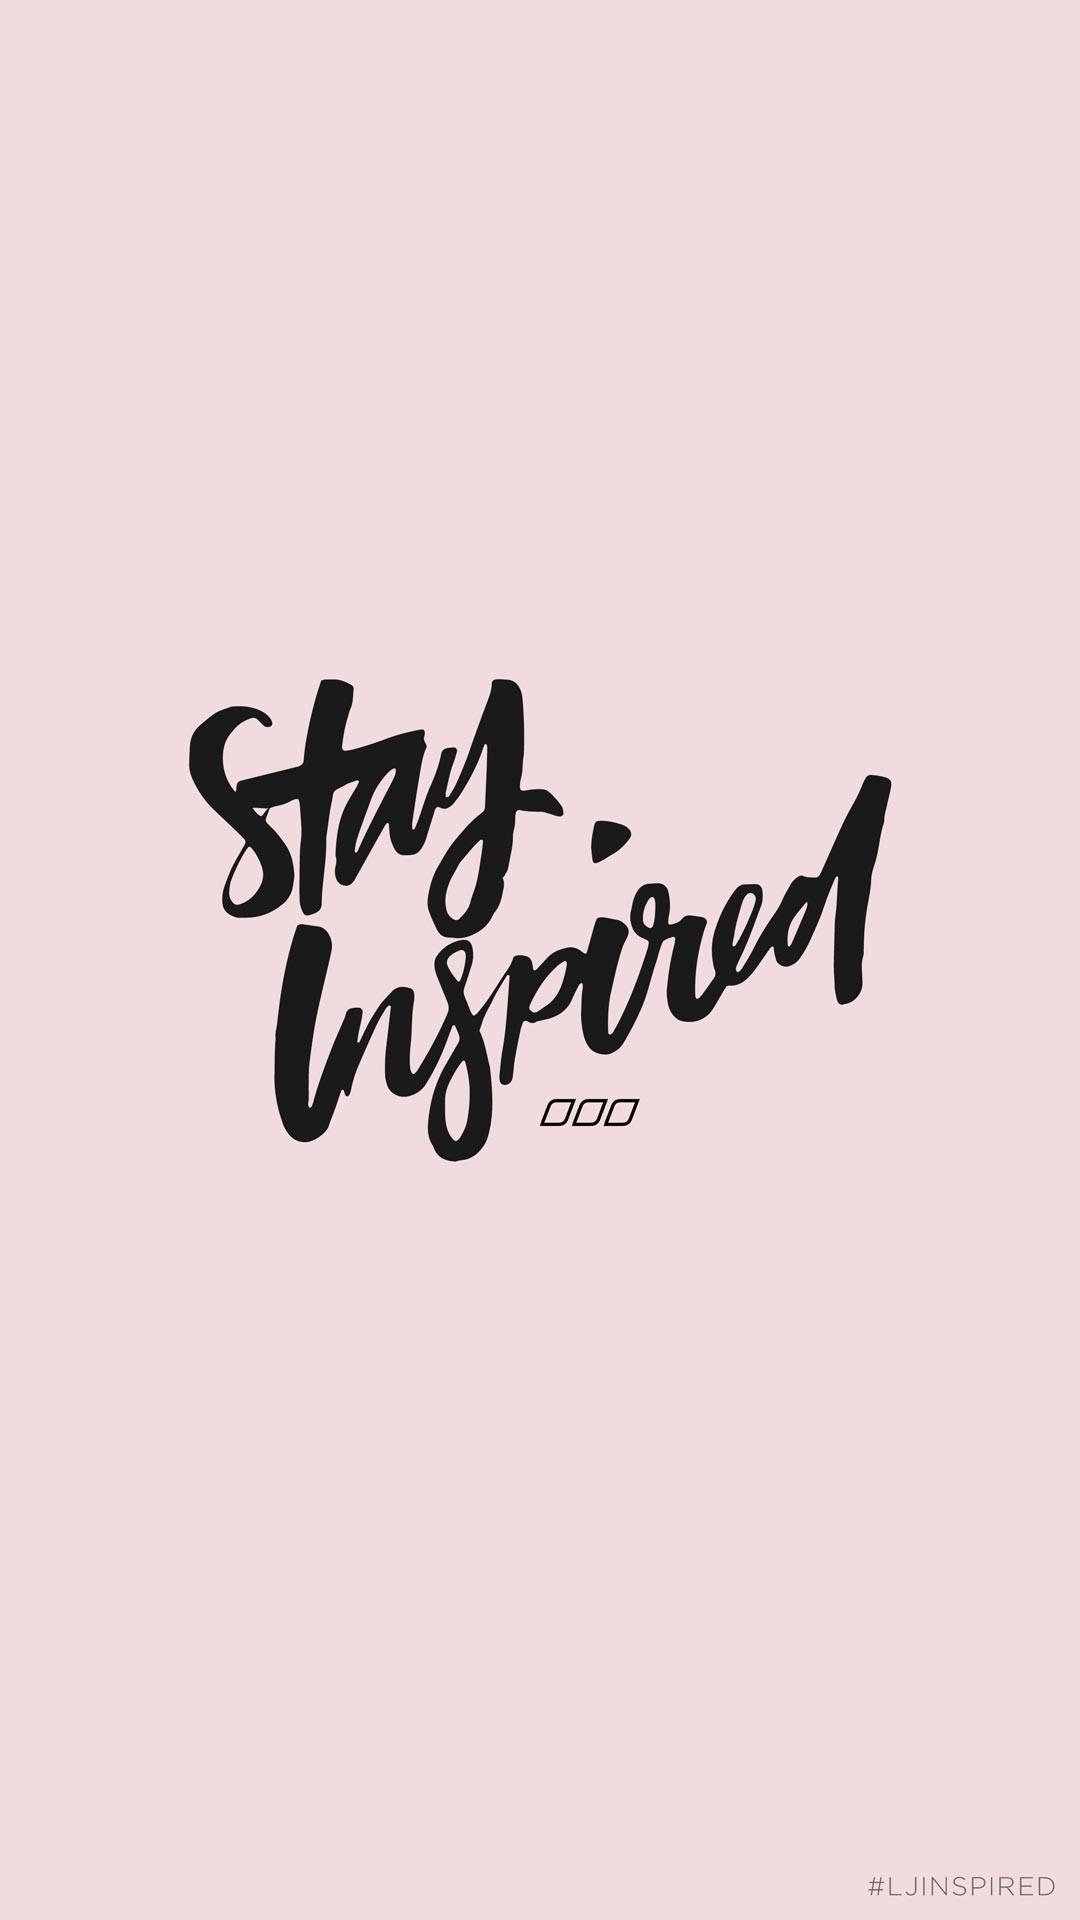 Cool Attitude Girl Hd Wallpaper Girly Inspirational Desktop Wallpaper 61 Images